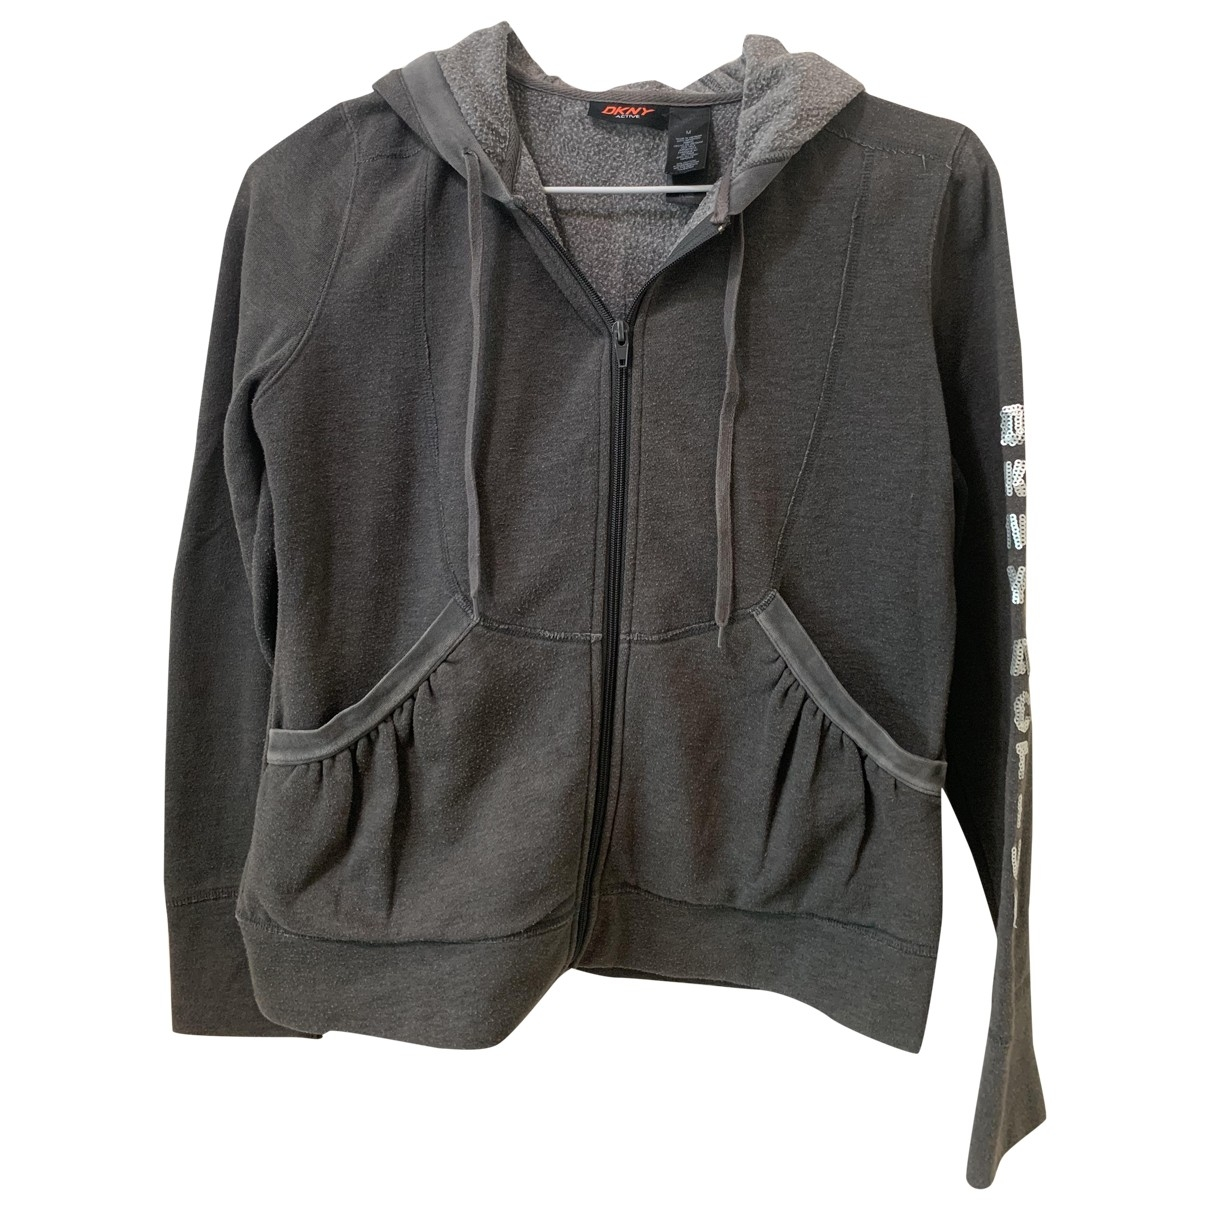 Dkny \N Grey Cotton jacket for Women M International